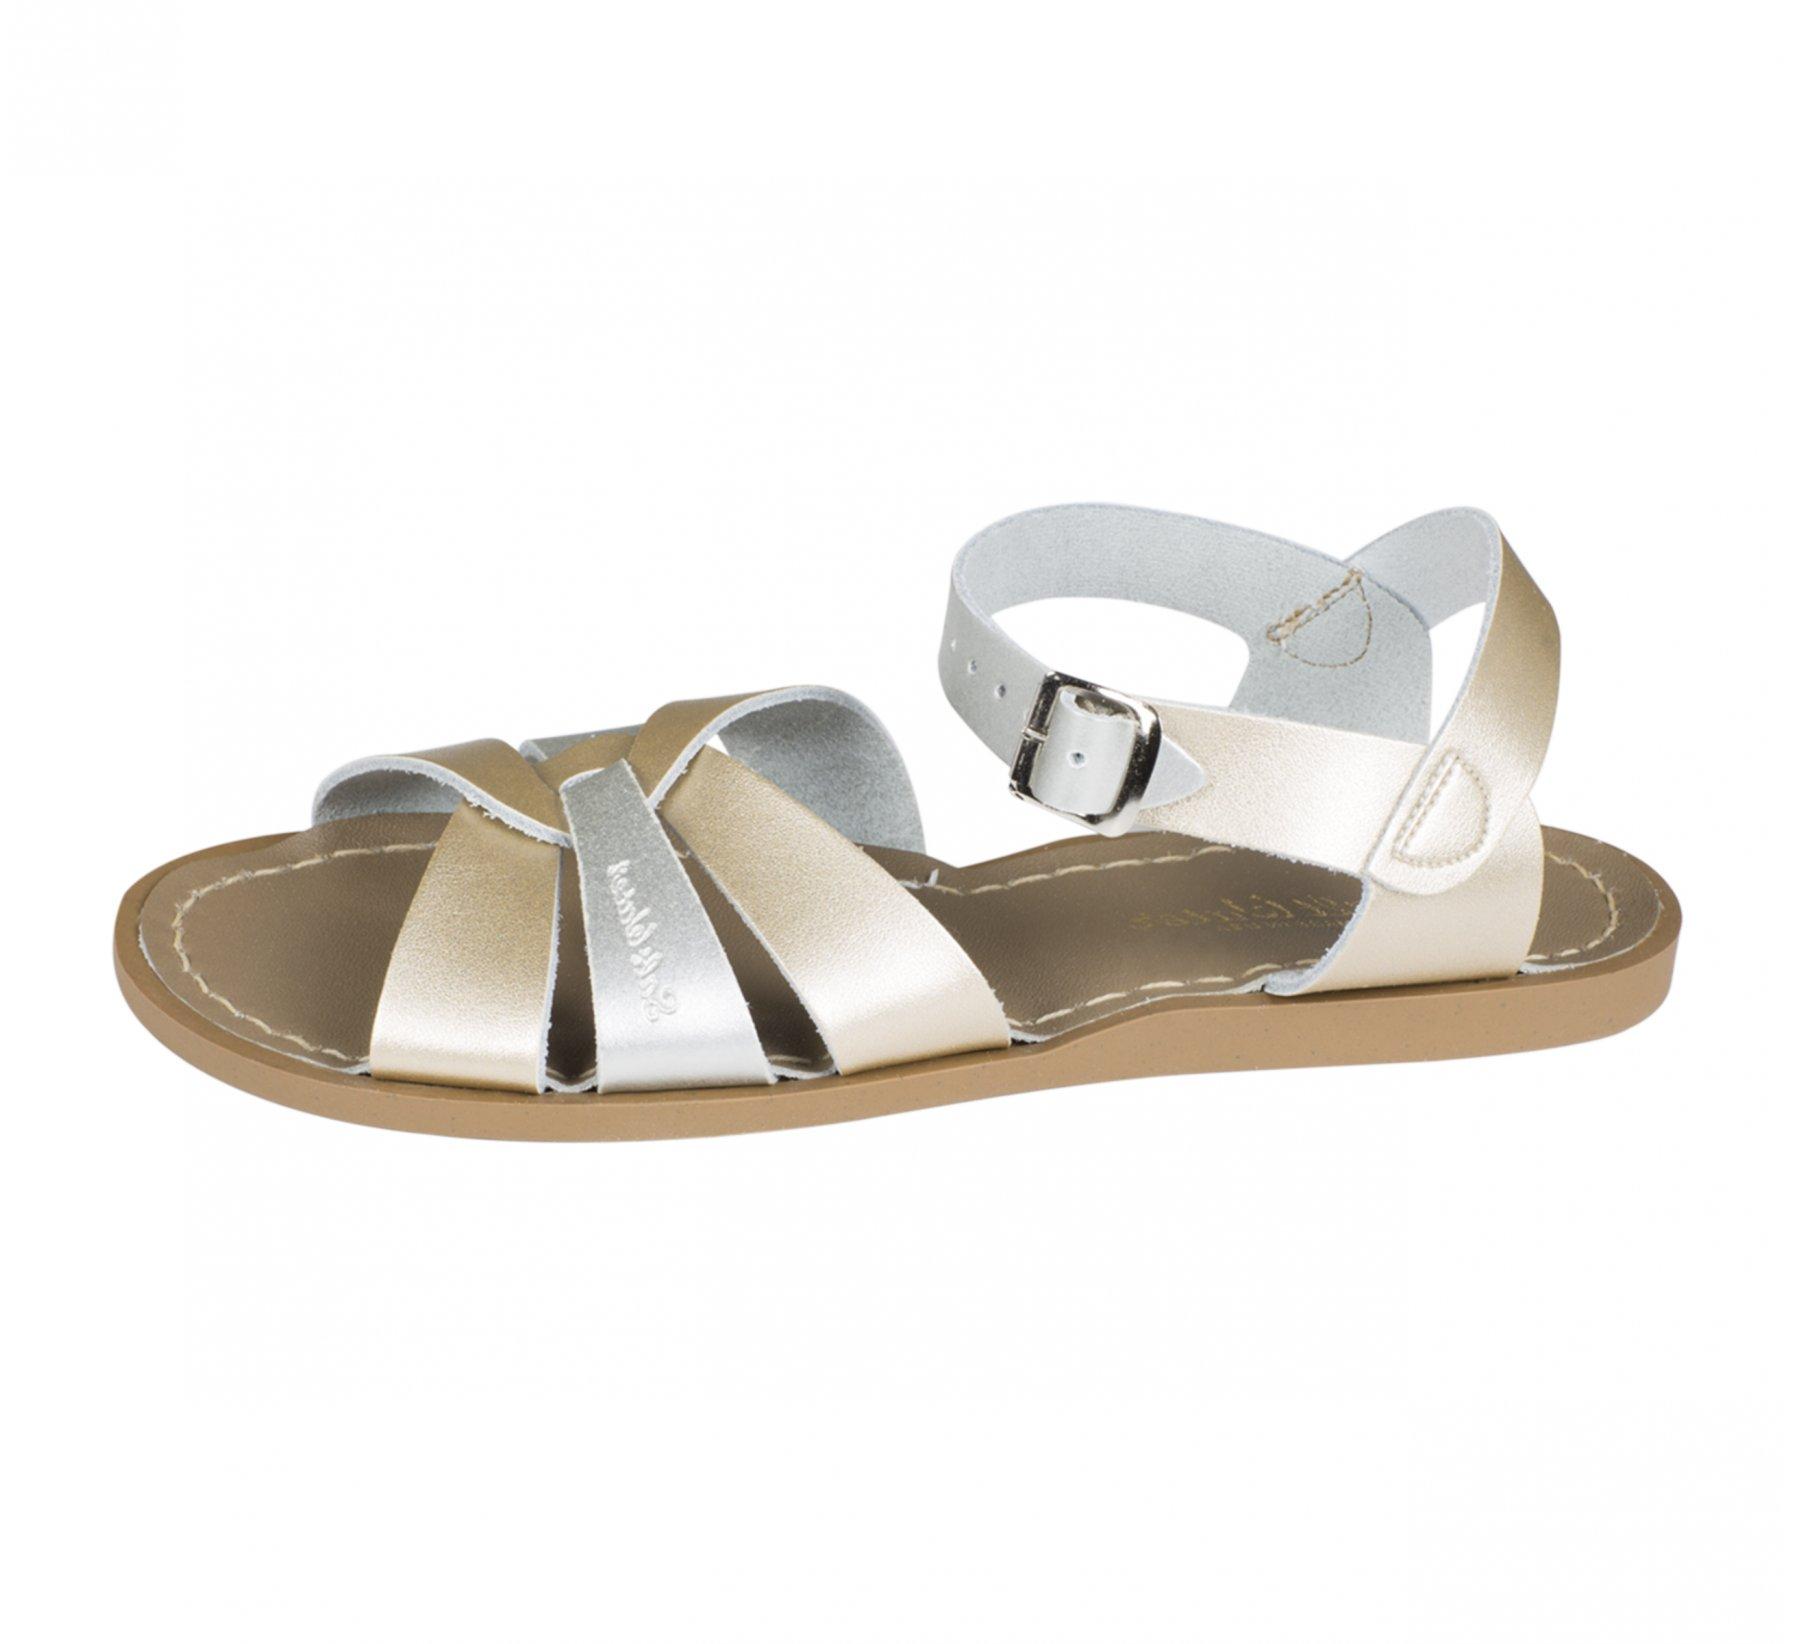 Original Mash-up Argent - Salt Water Sandals